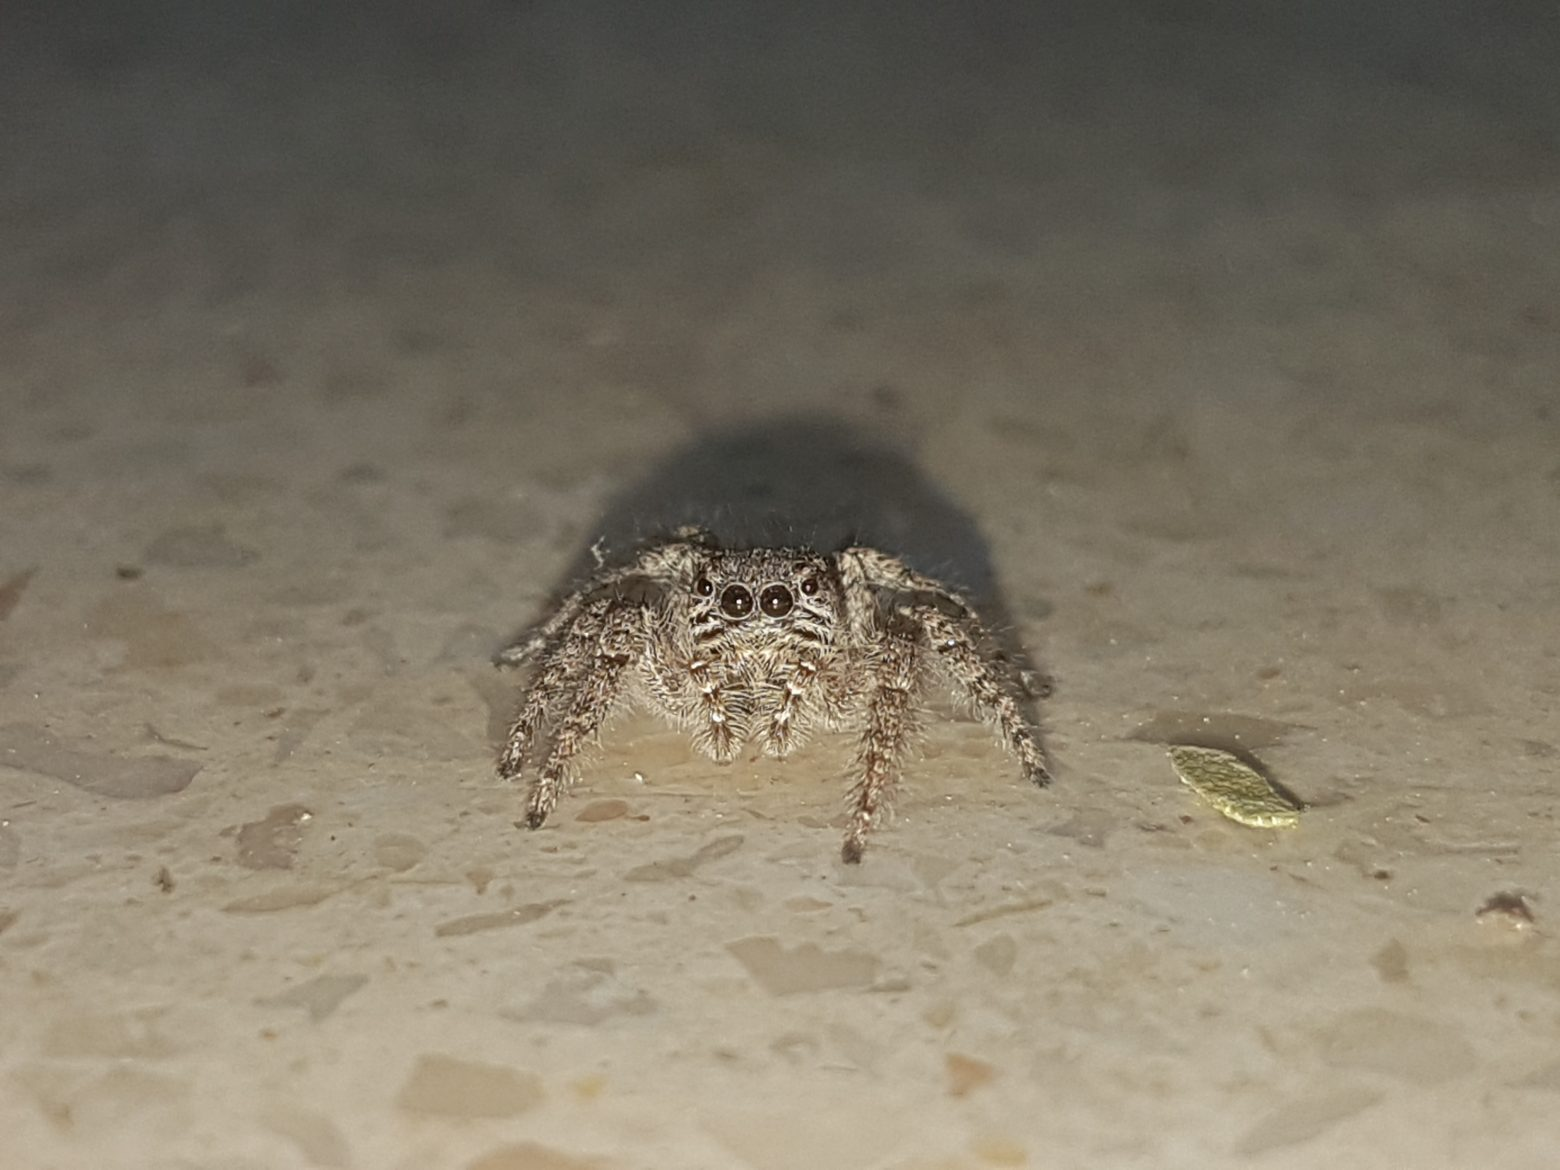 ۲۰۱۸۰۳۲۹ ۱۸۳۱۲۹ 1560x1170 - عنکبوت پشمالو